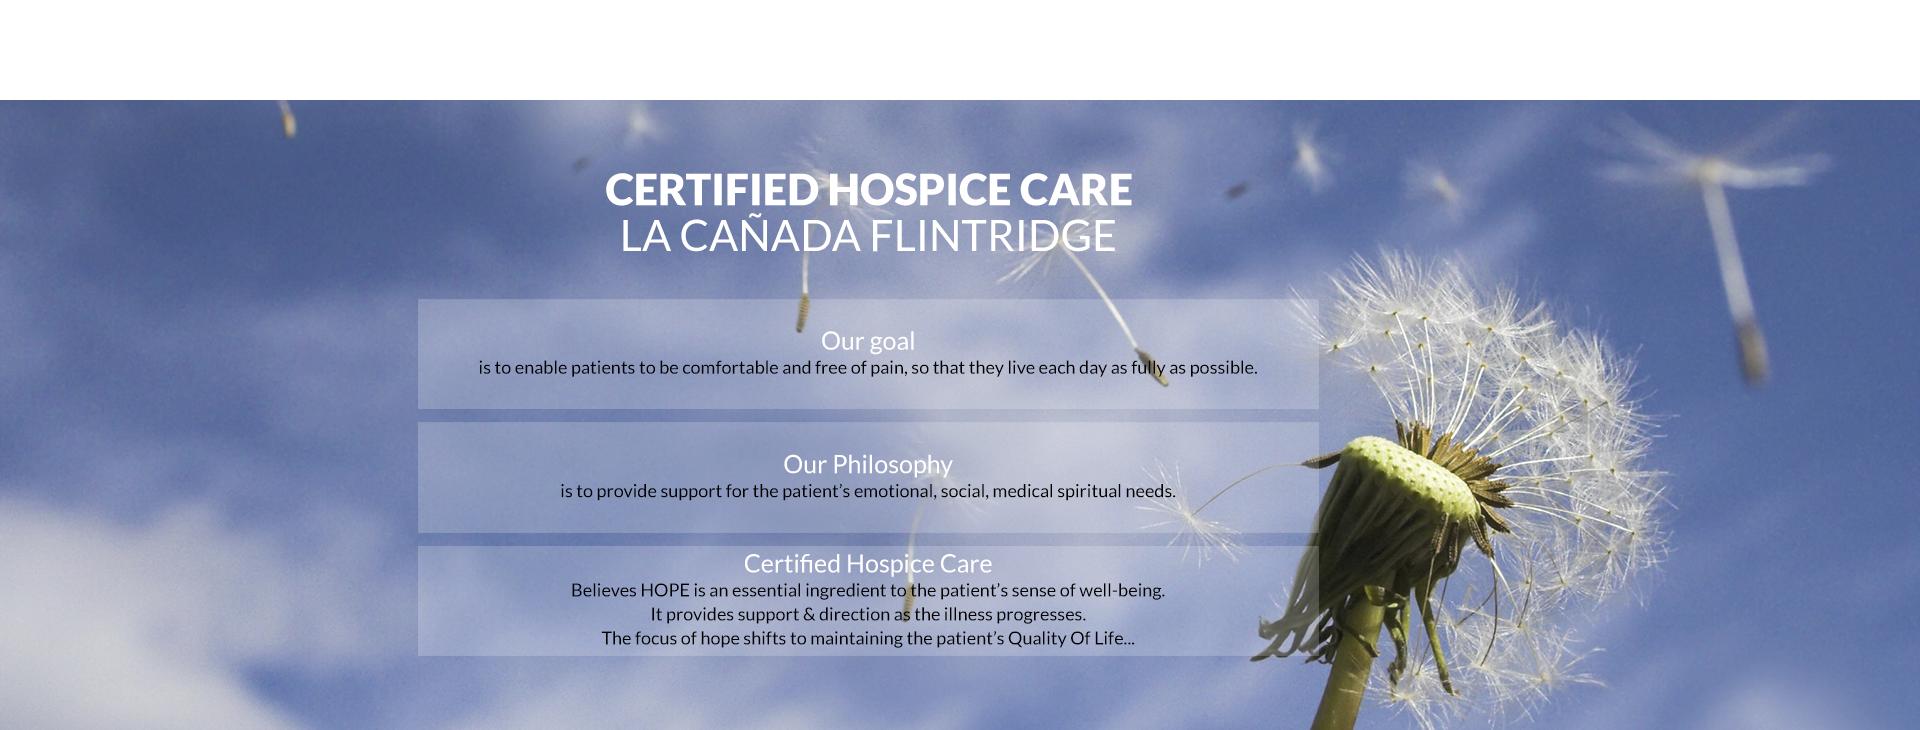 certifiedhospicecare-slider-01